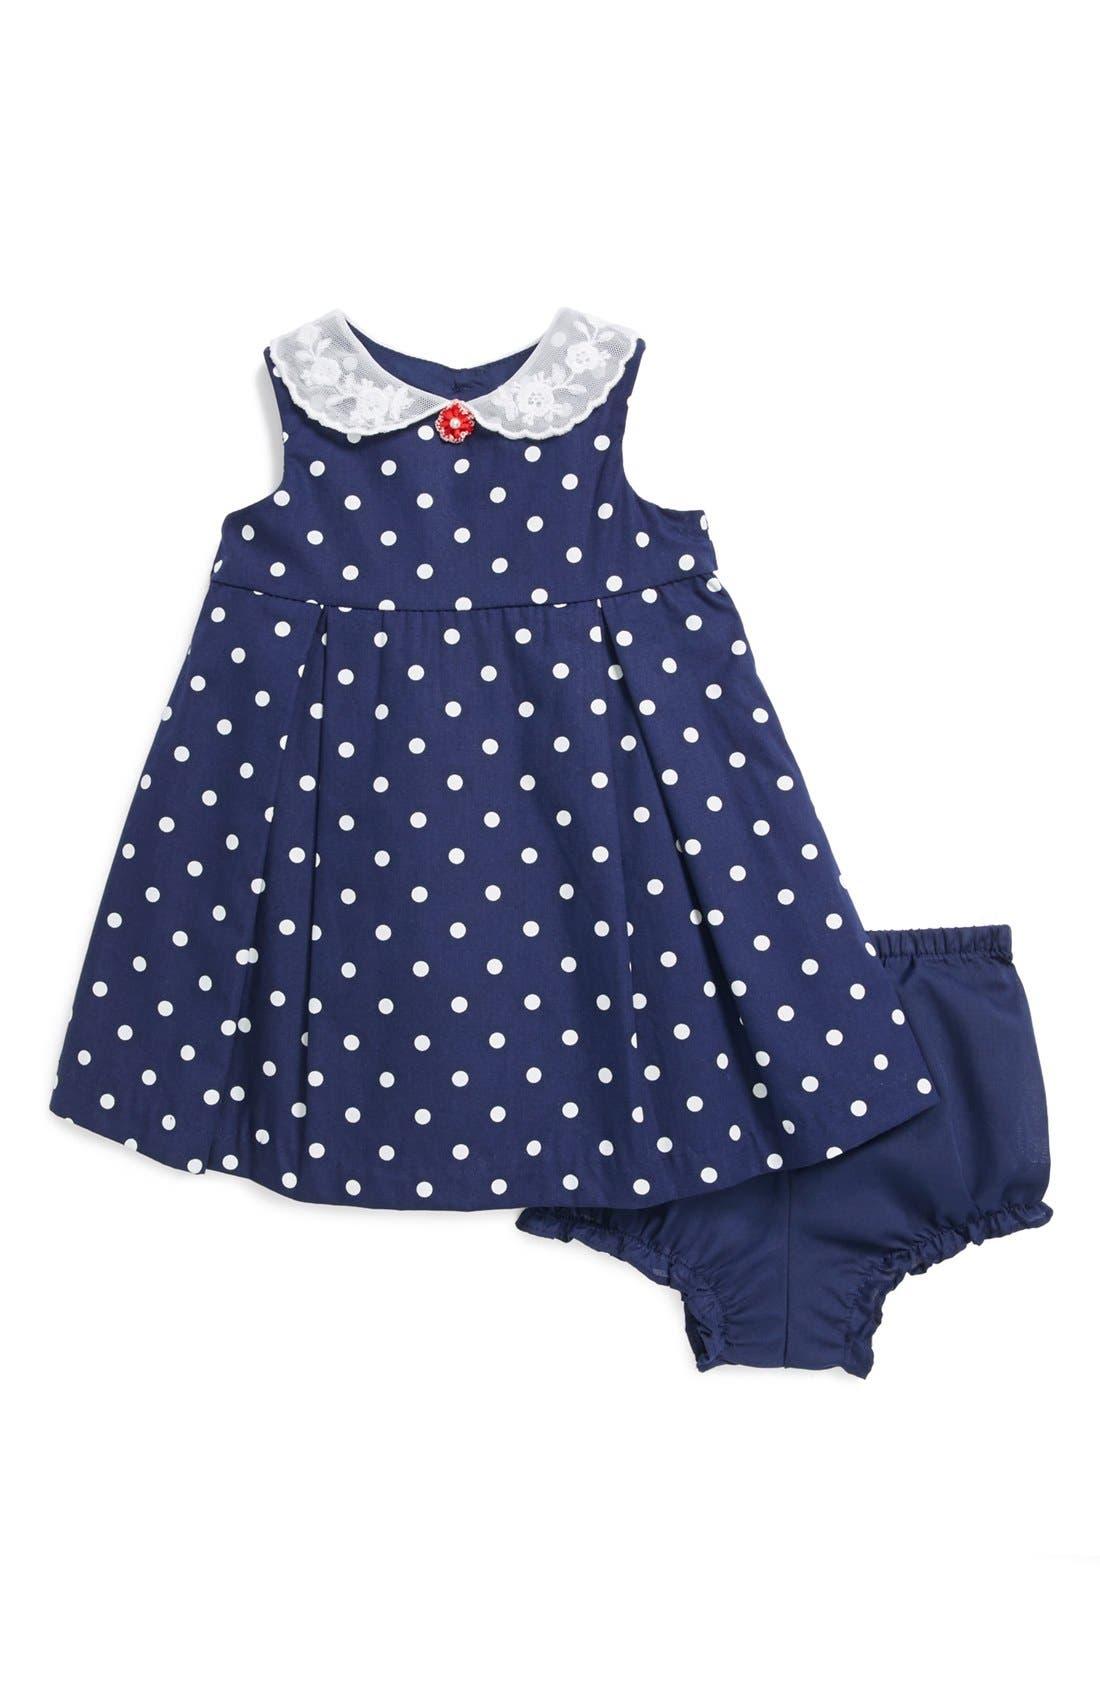 Alternate Image 1 Selected - Pippa & Julie Polka Dot Dress & Bloomers (Baby Girls)